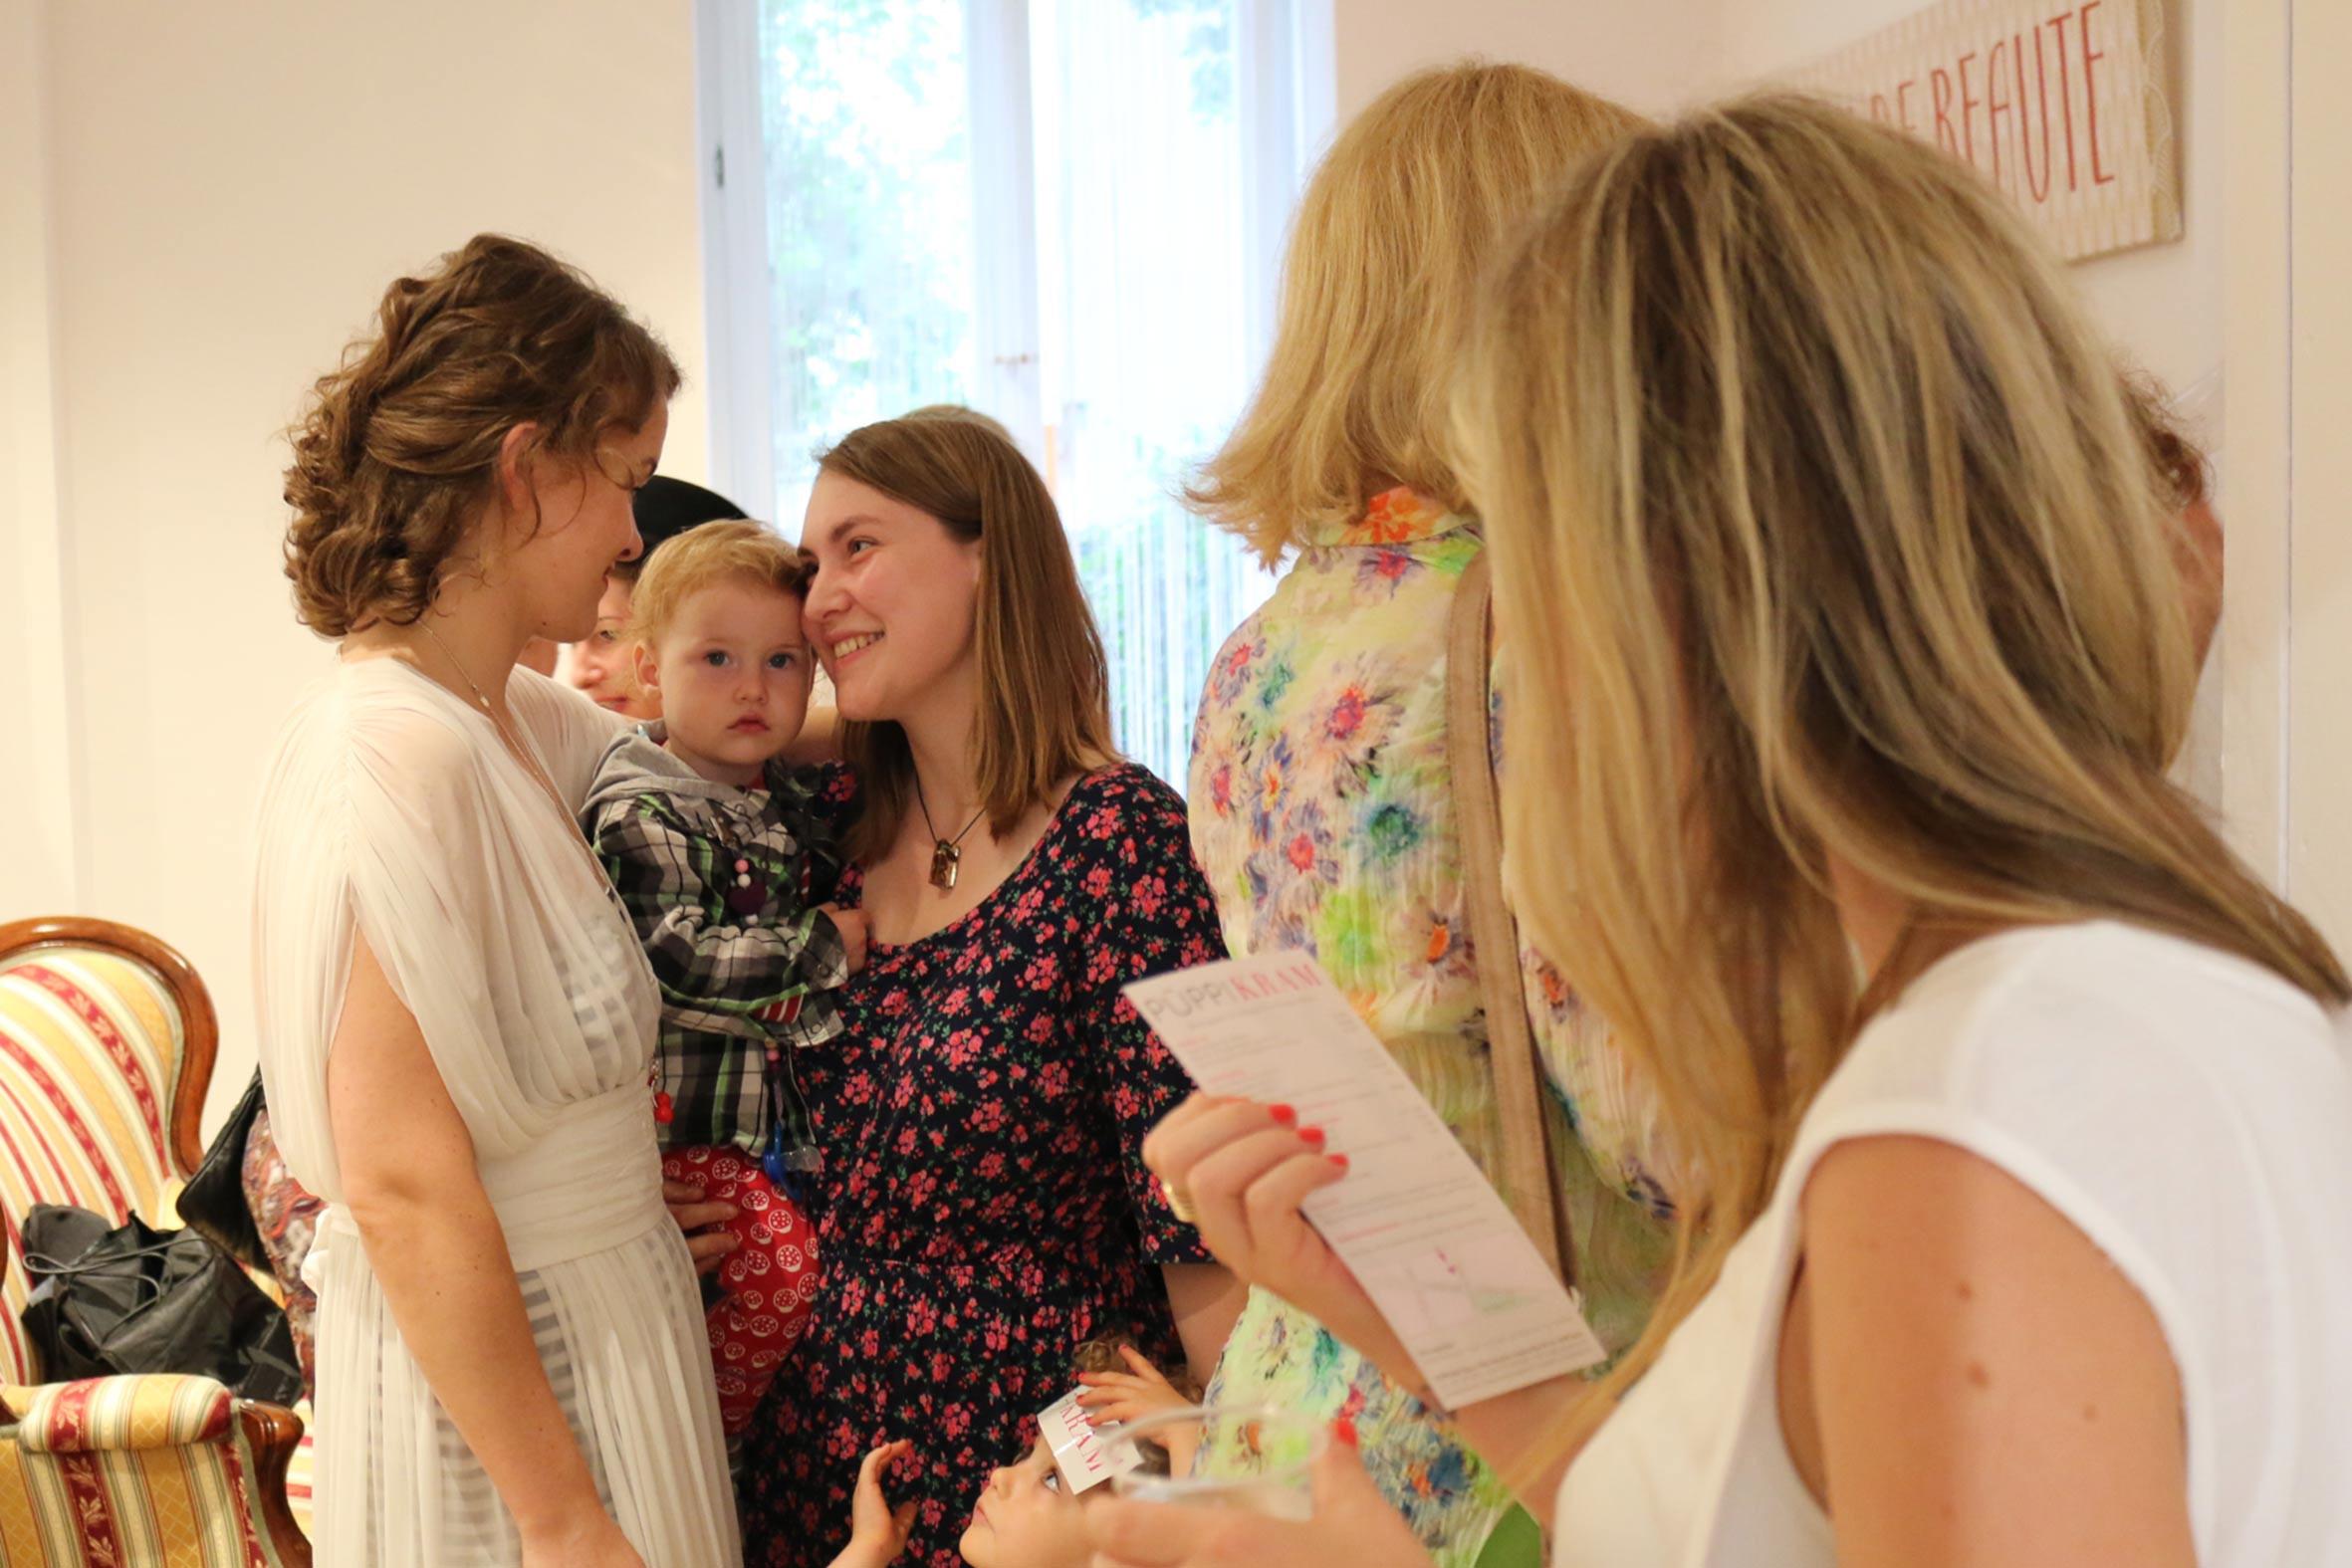 Geburtstagsfeier Mal Anders  Geburtstagsfeier im Beautysalon PÜPPIKRAM 2 Jahre Hair